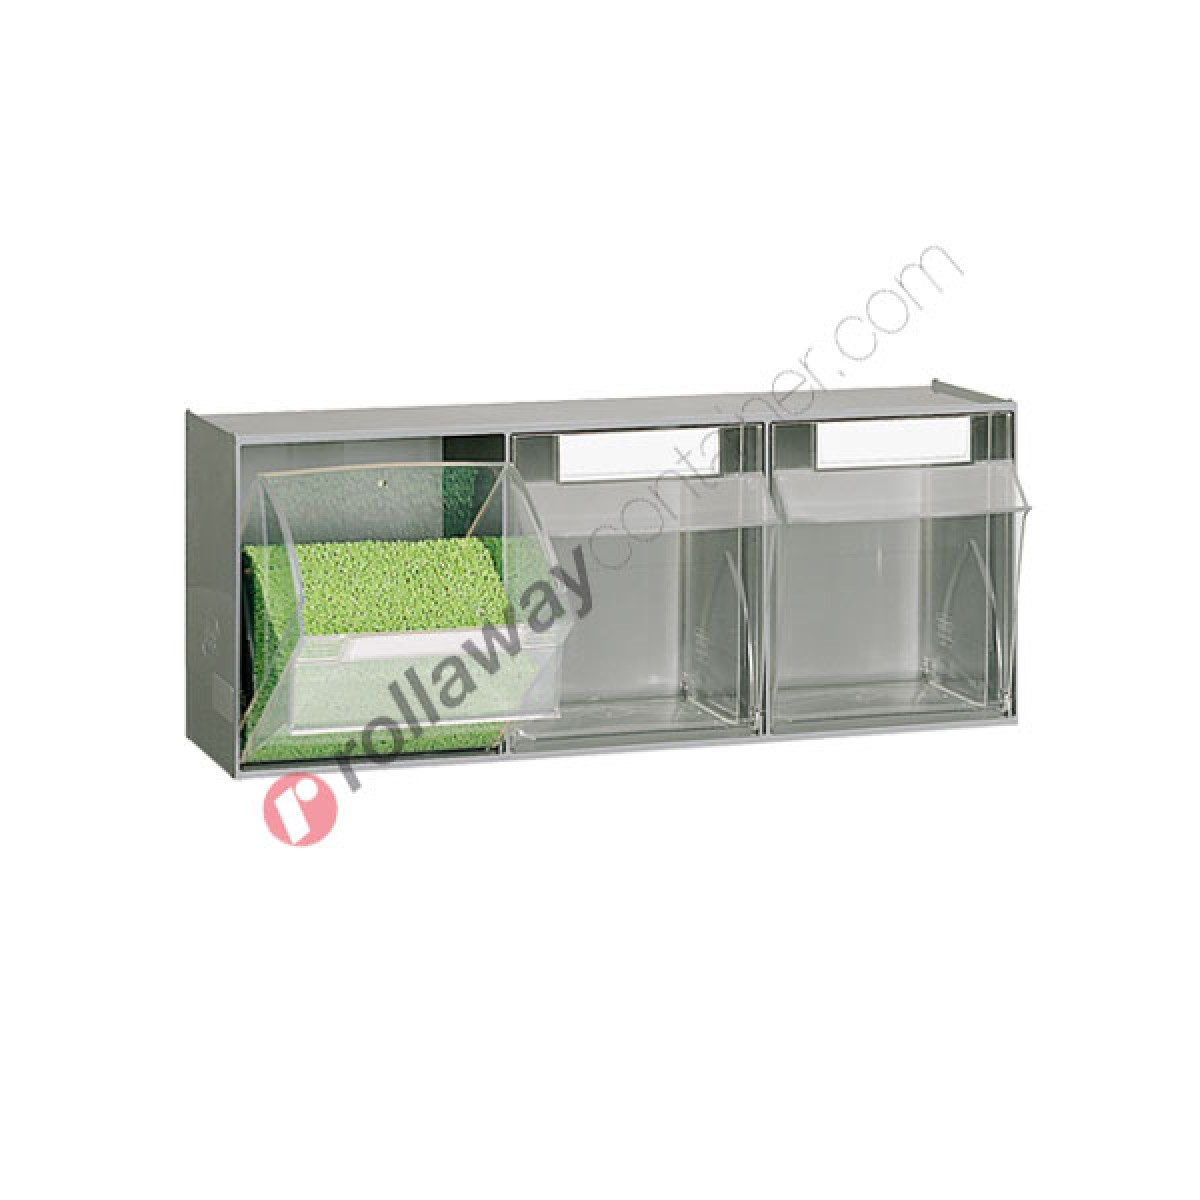 rangement visserie atelier 600 x 209 h 240 mm avec 3 tiroirs. Black Bedroom Furniture Sets. Home Design Ideas